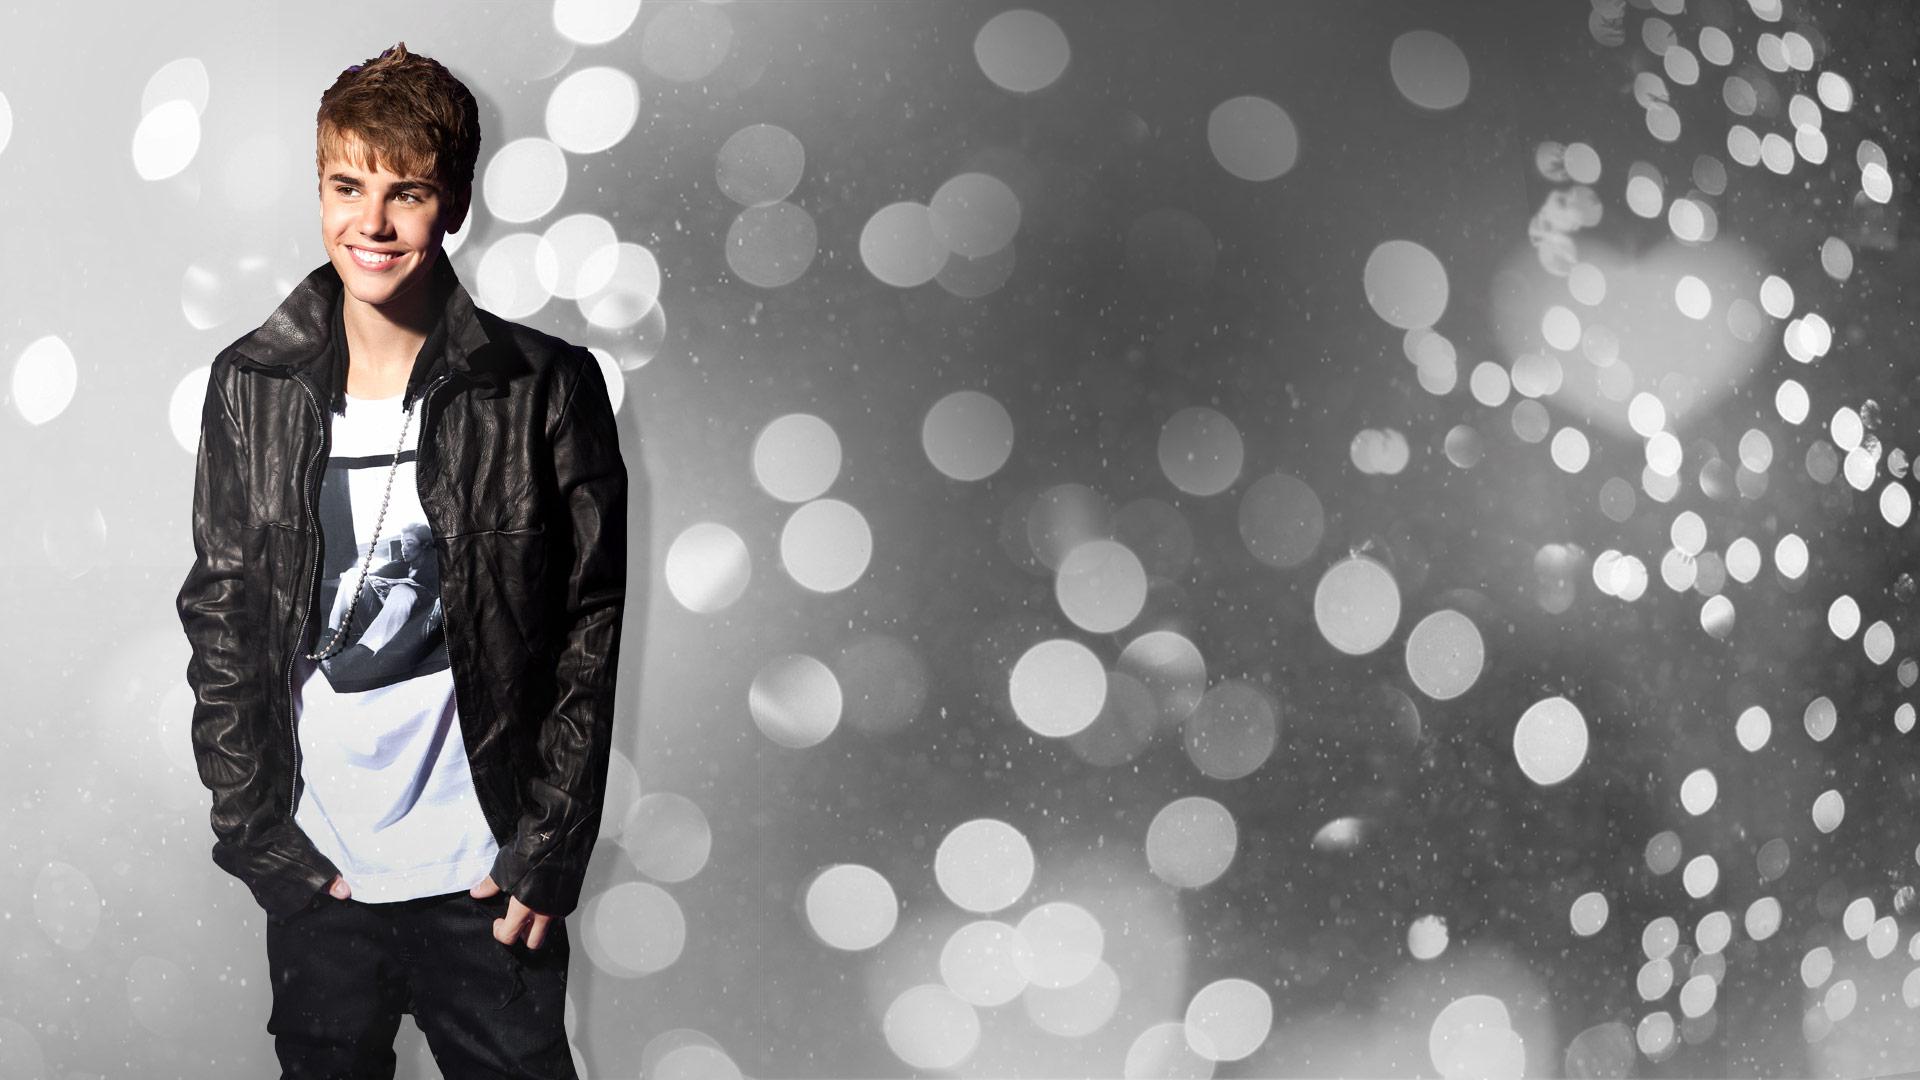 50+] Justin Bieber HD Wallpaper 2015 on WallpaperSafari